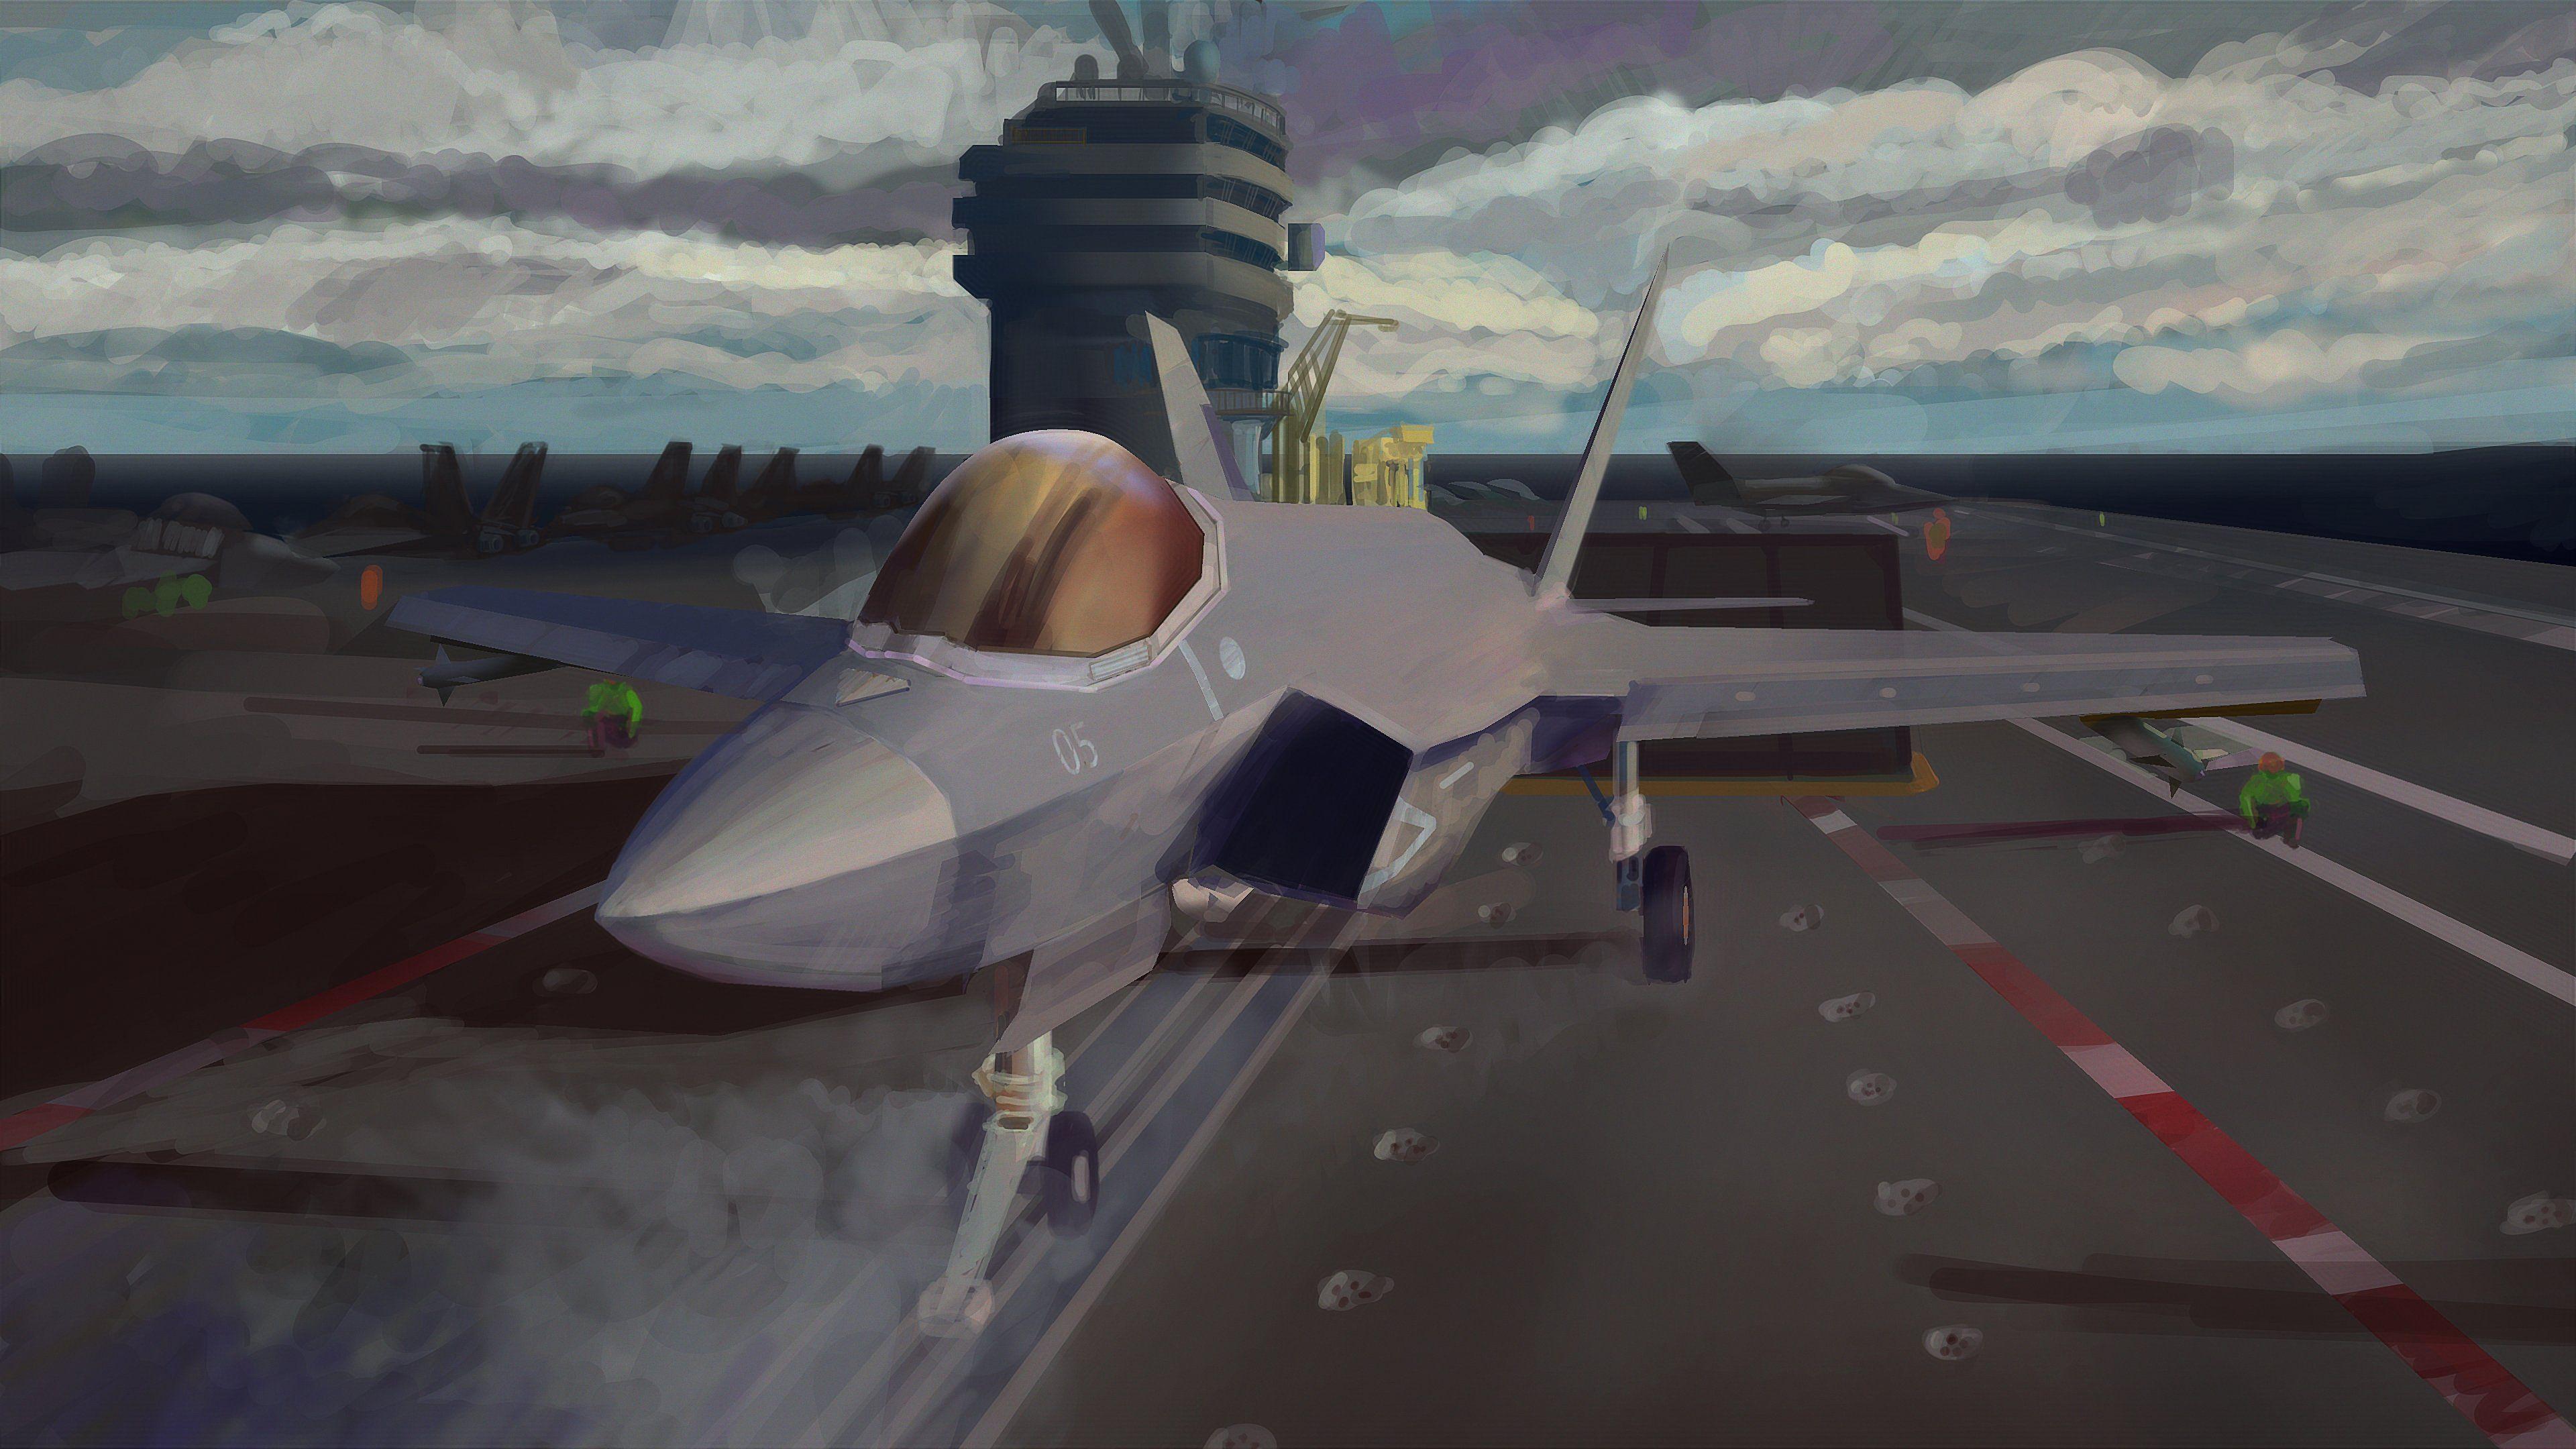 Fighter jet study #digitalart #digitaldrawing #digitalsketch #artists #digitalpainting #digitalillustration #PaintstormStudio #artwork #krita #conceptart #conceptdesign #gameart #plane #rendering #paintstorm